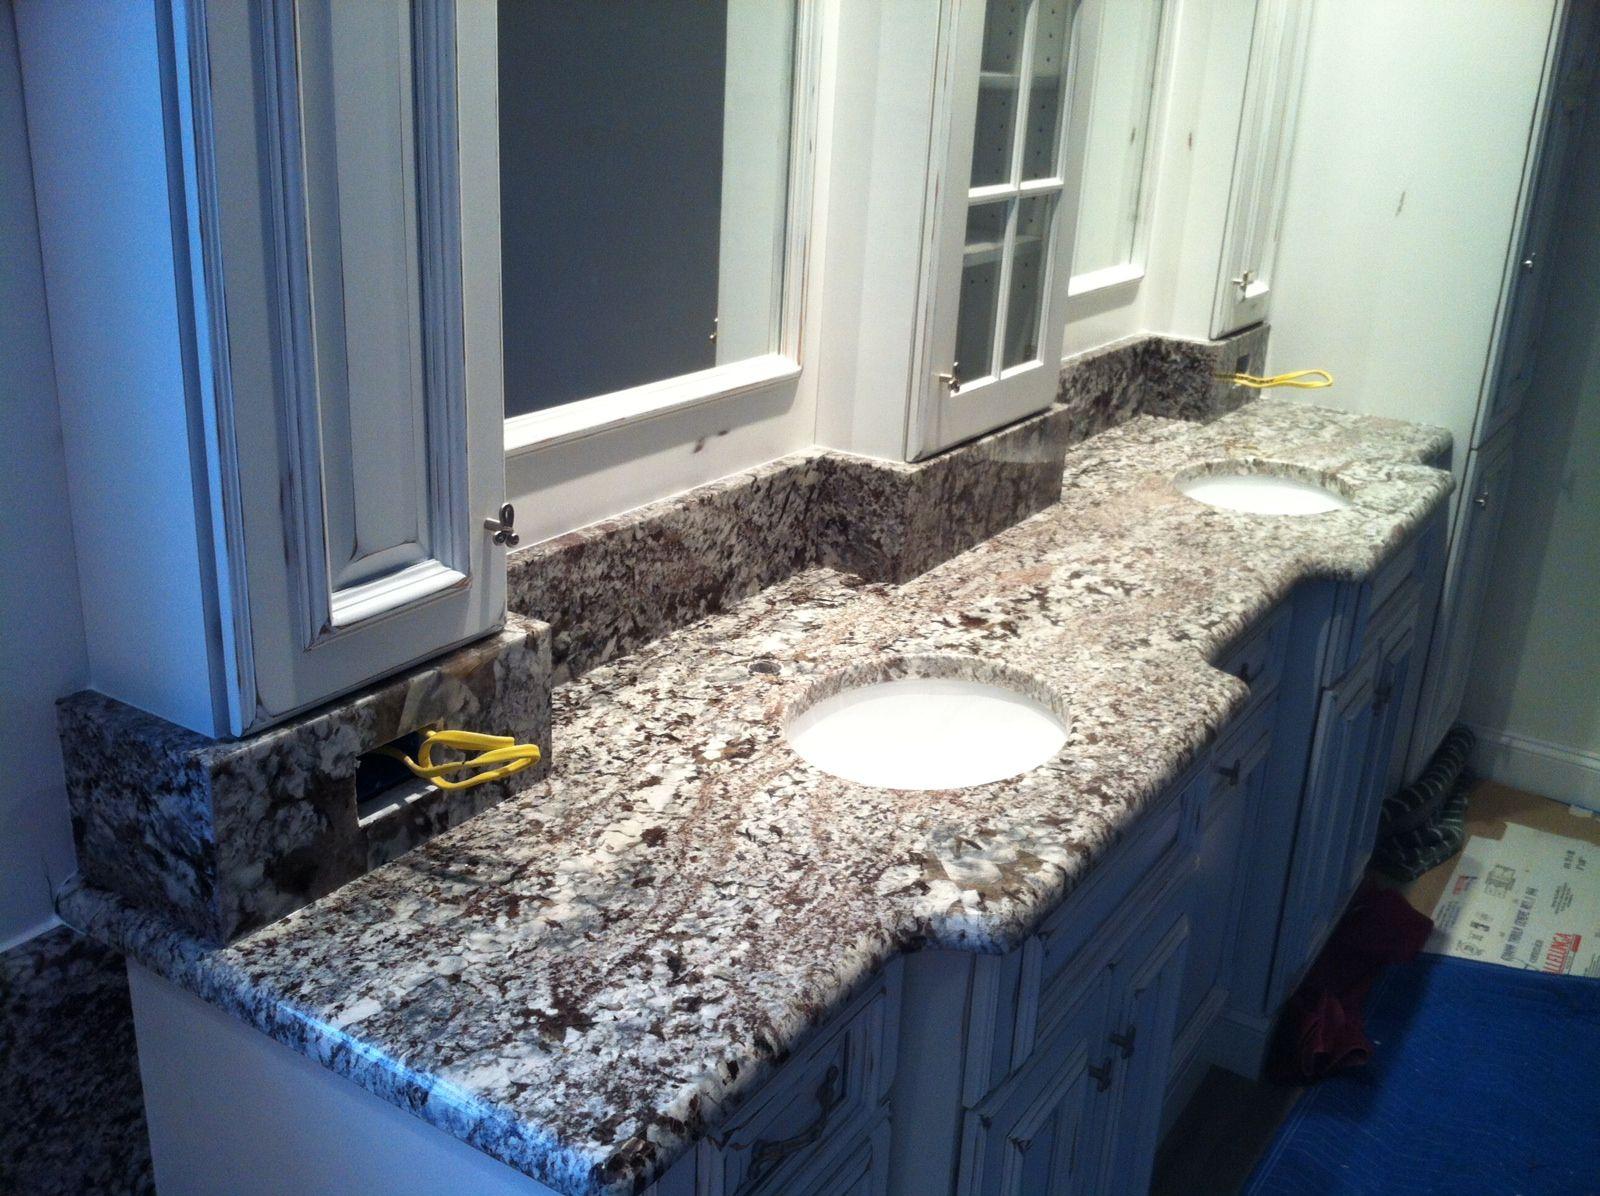 Lennon granite vanity top by natural stoneworks bathrooms pinterest granite vanity tops for Granite vanity tops for bathrooms